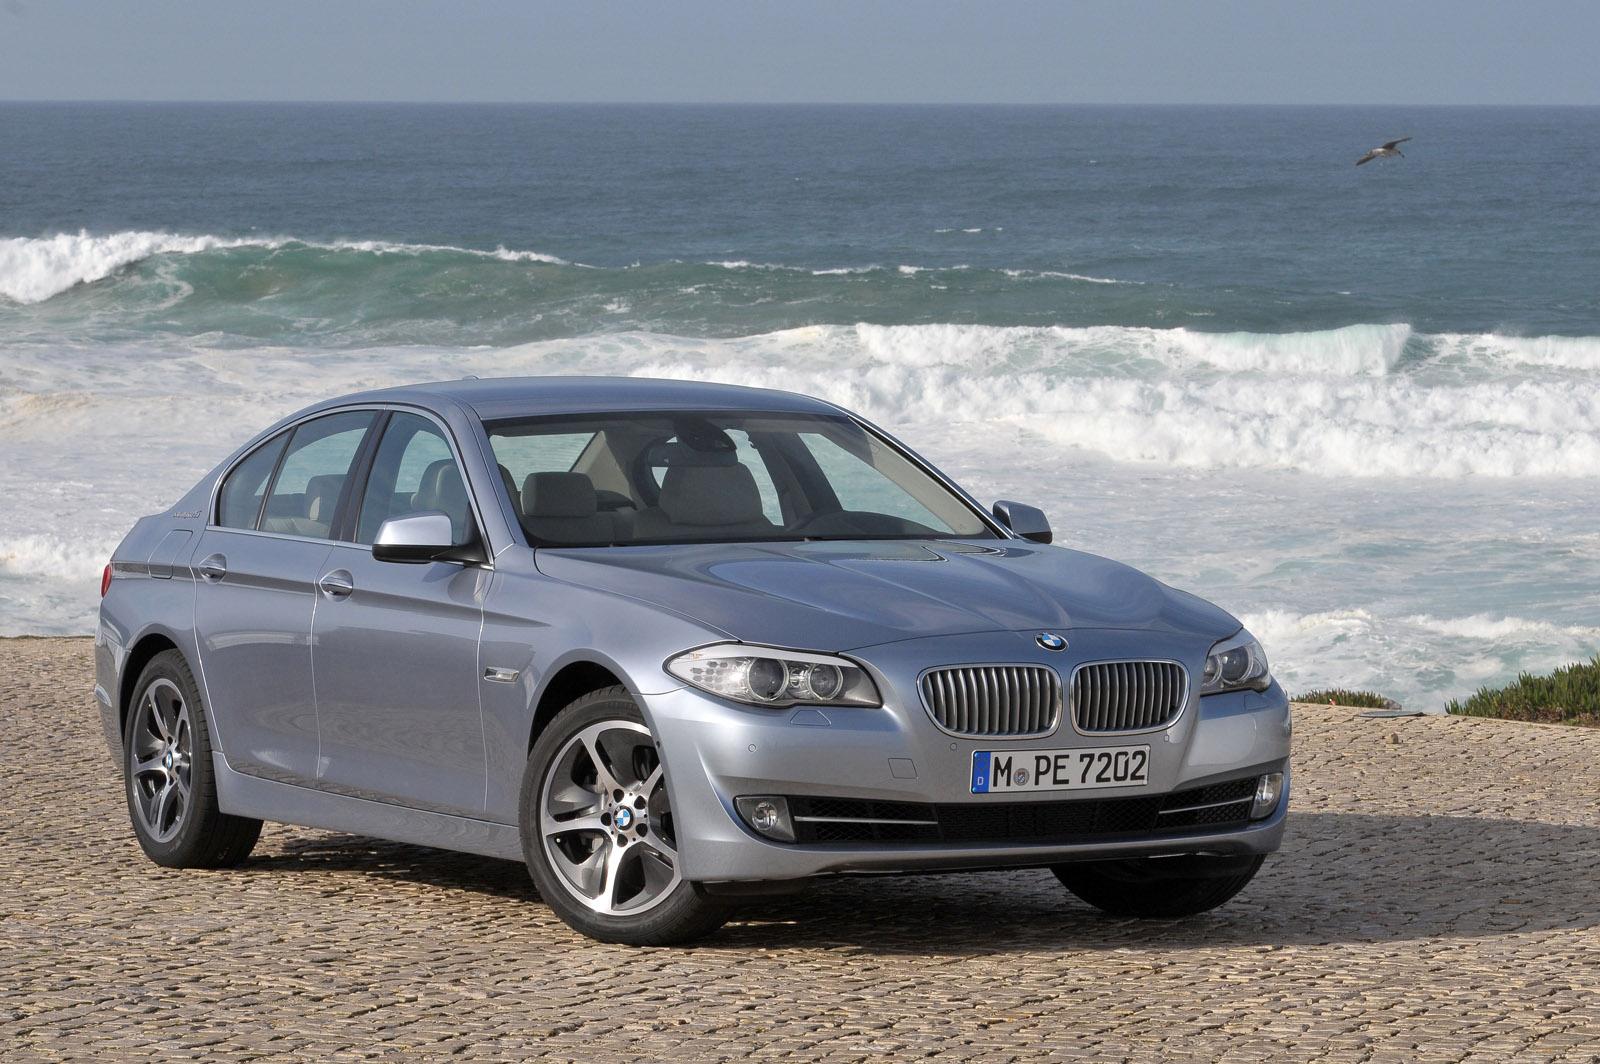 http://3.bp.blogspot.com/-50zVNZTKJyo/T-PEurd_u6I/AAAAAAAAD6o/zdT6u_g3_Bc/s1600/BMW+ActiveHybrid+5+Hd+Wallpapers+2013_1.jpg